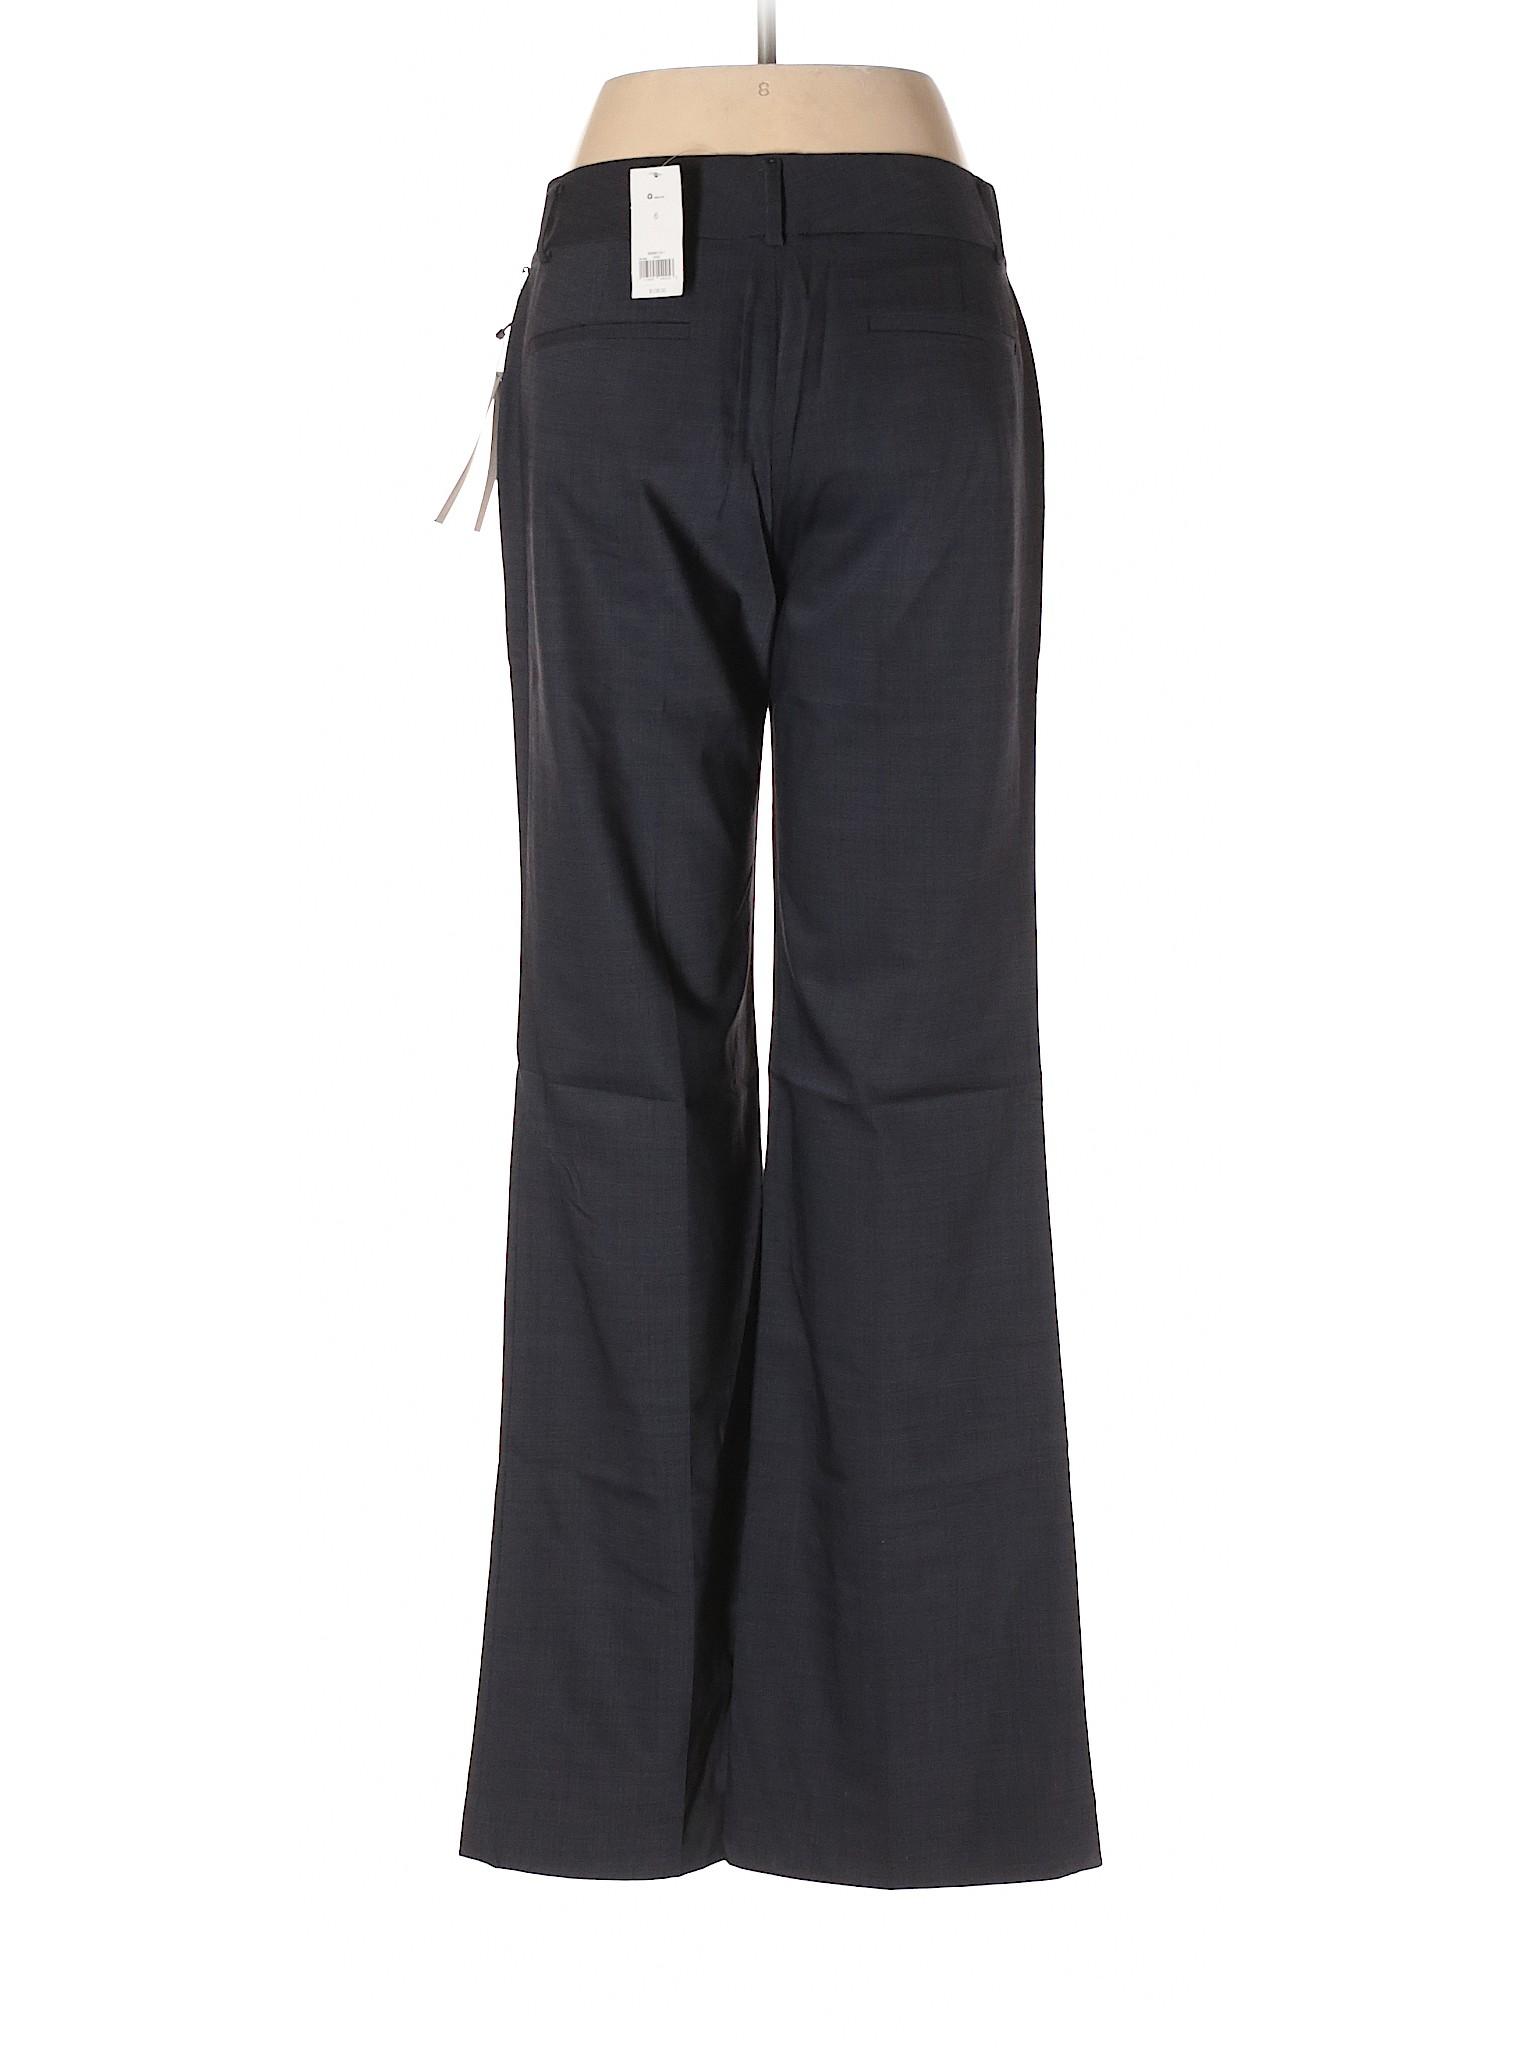 Republic Wool Banana Pants Boutique leisure nwYxSq8EP